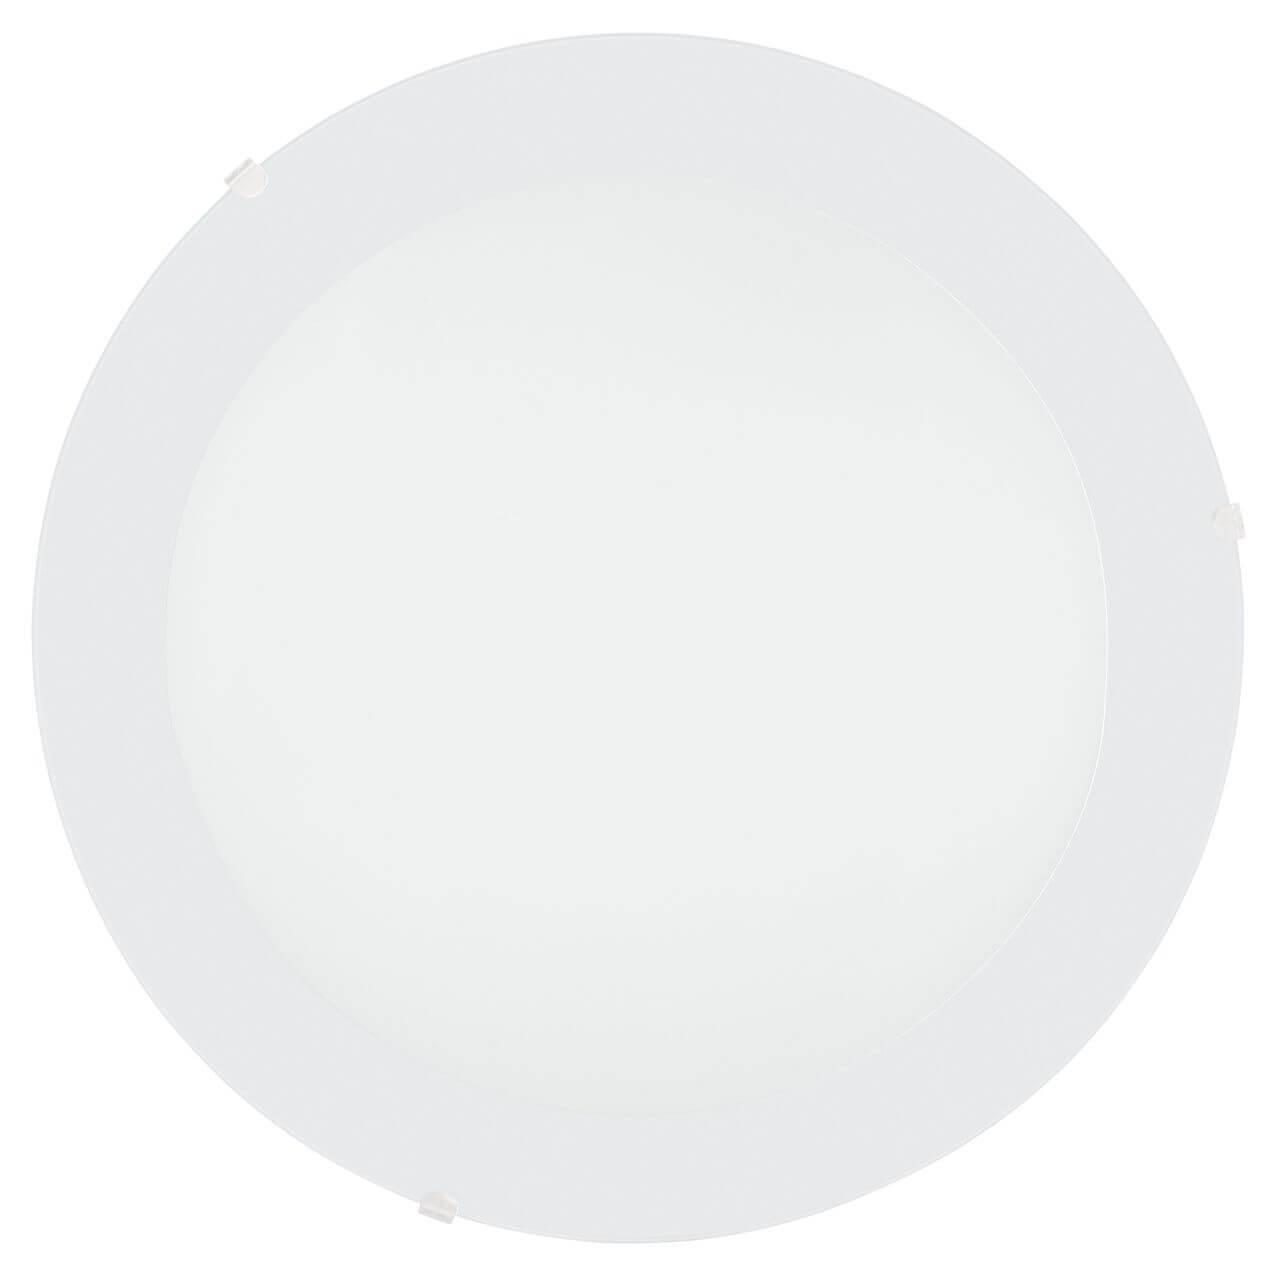 Светильник Eglo 86081 Albedo